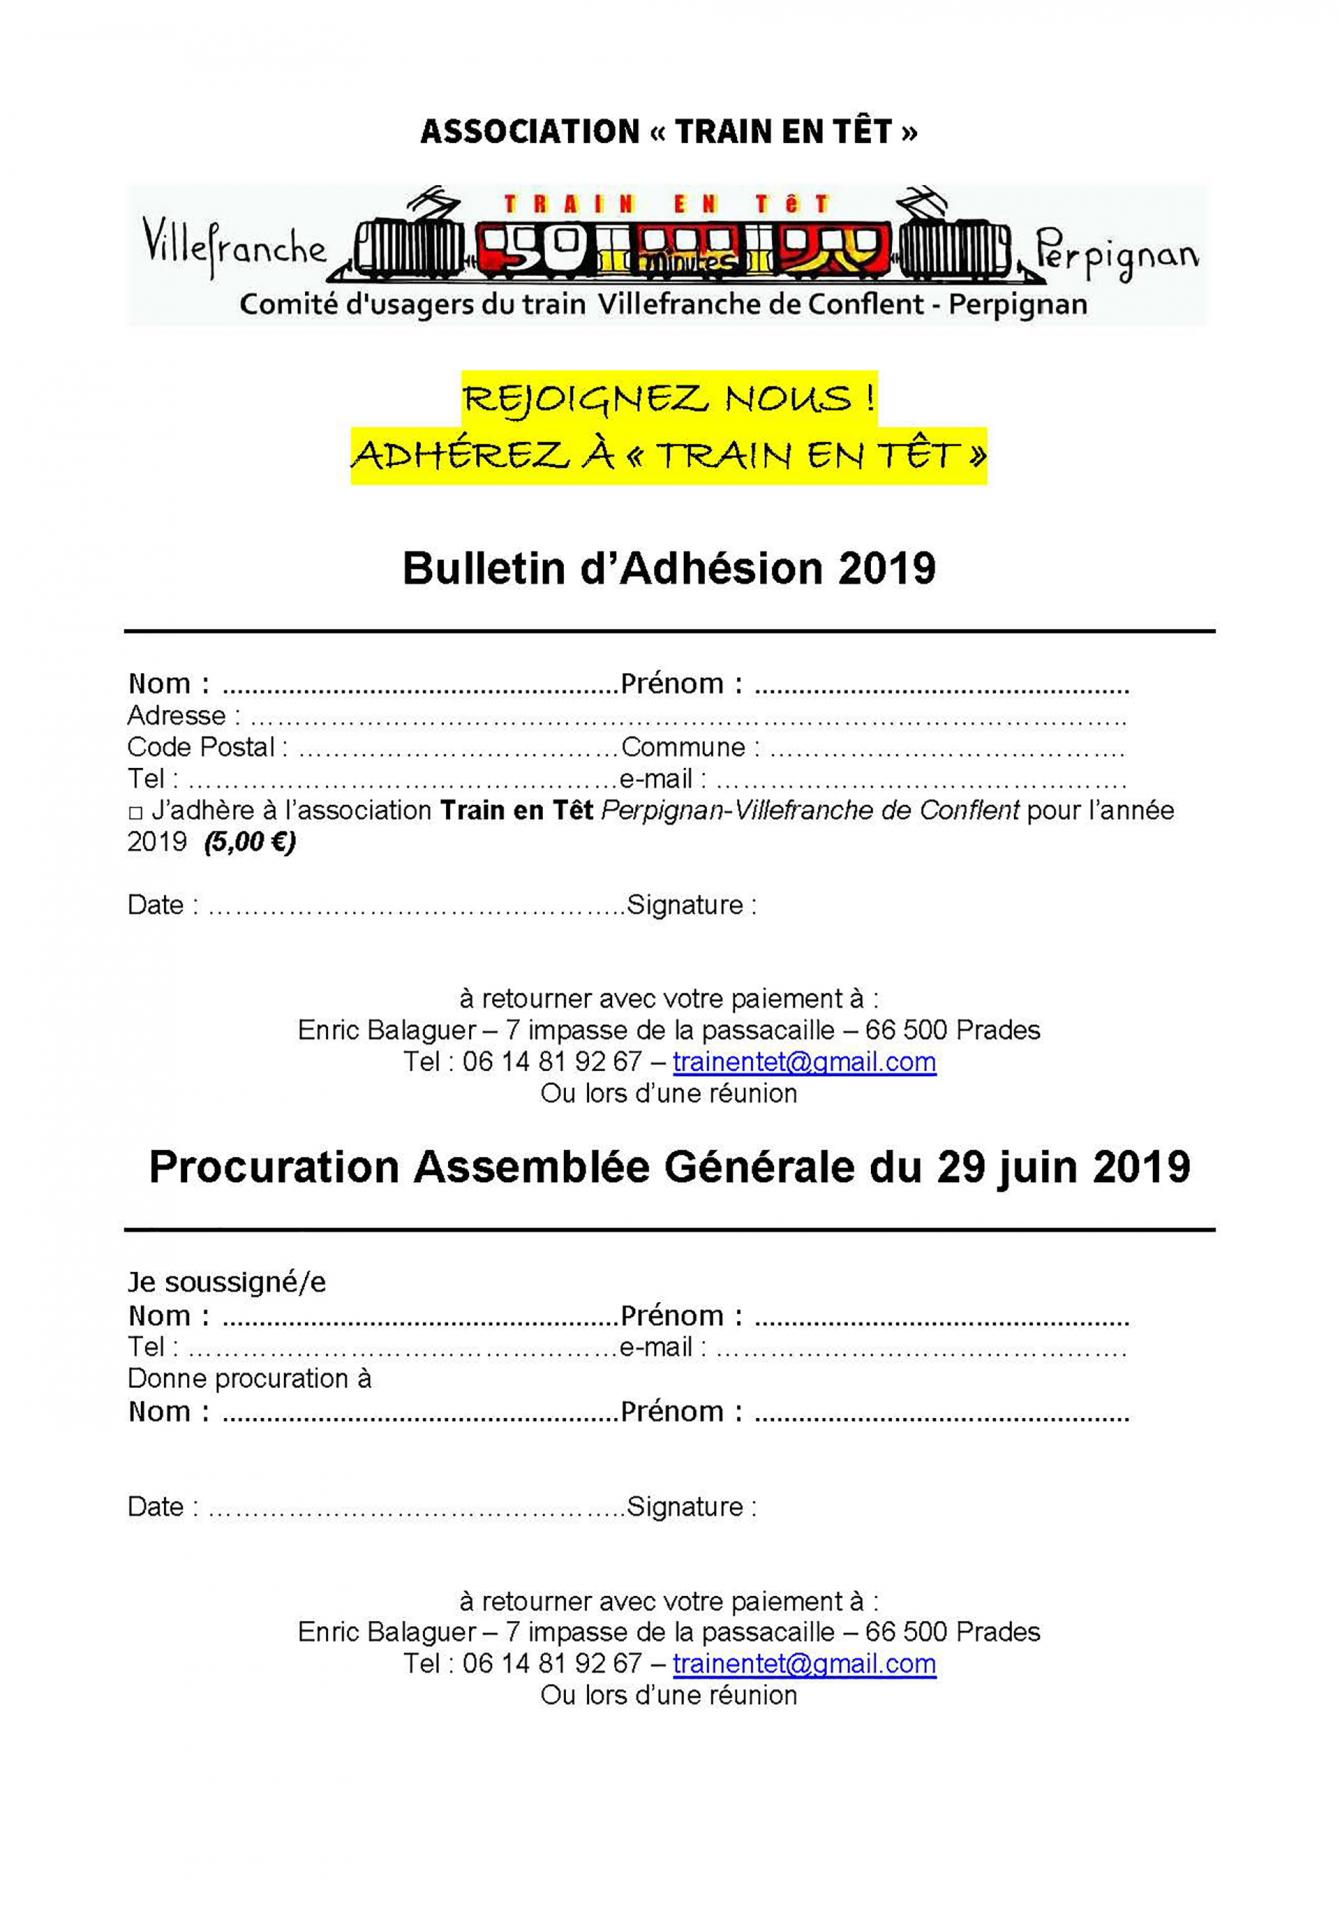 Bulletin d adhesion train en tet 2019